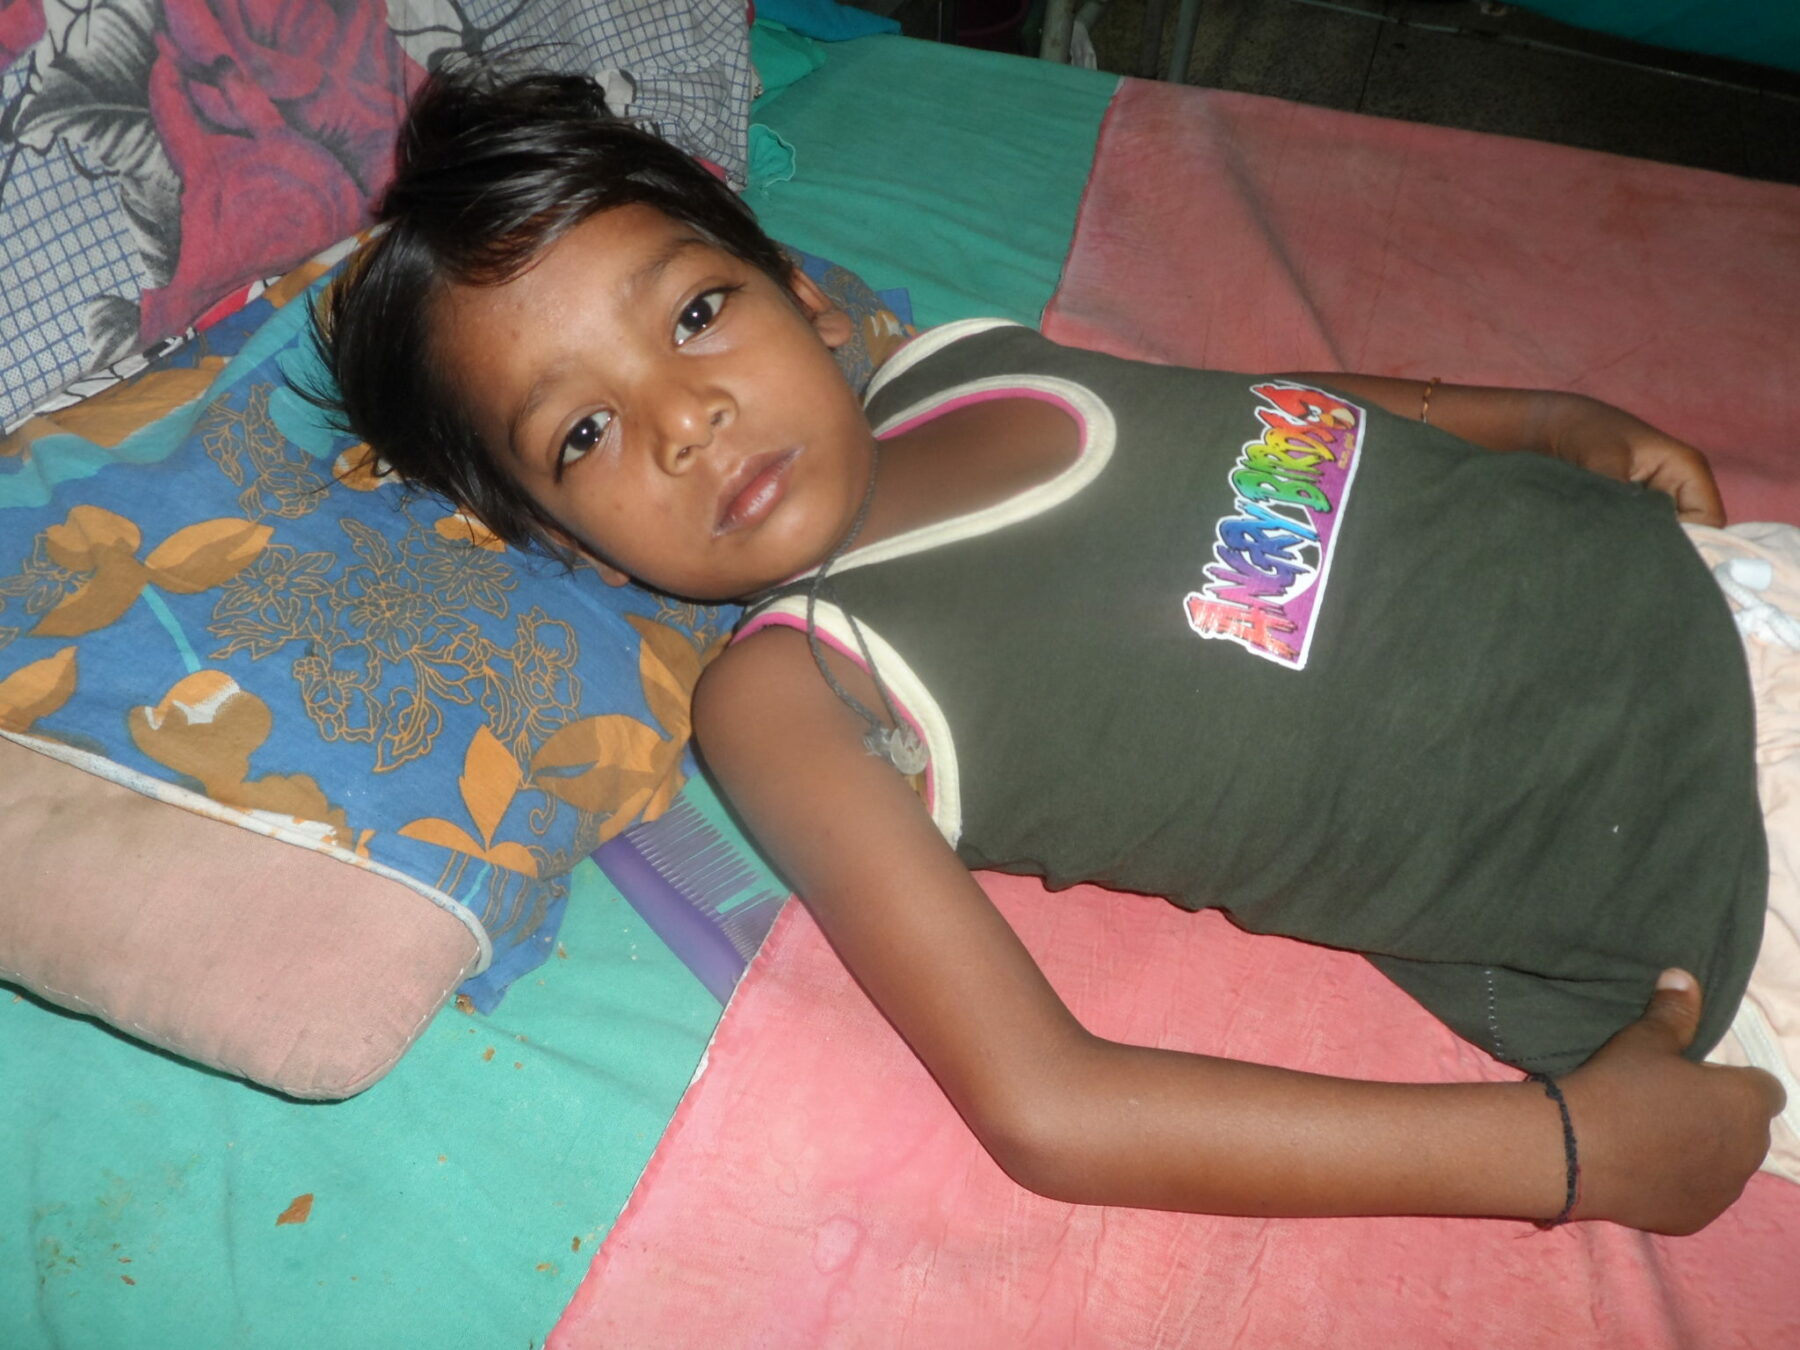 Tuberkulose bei Kindern